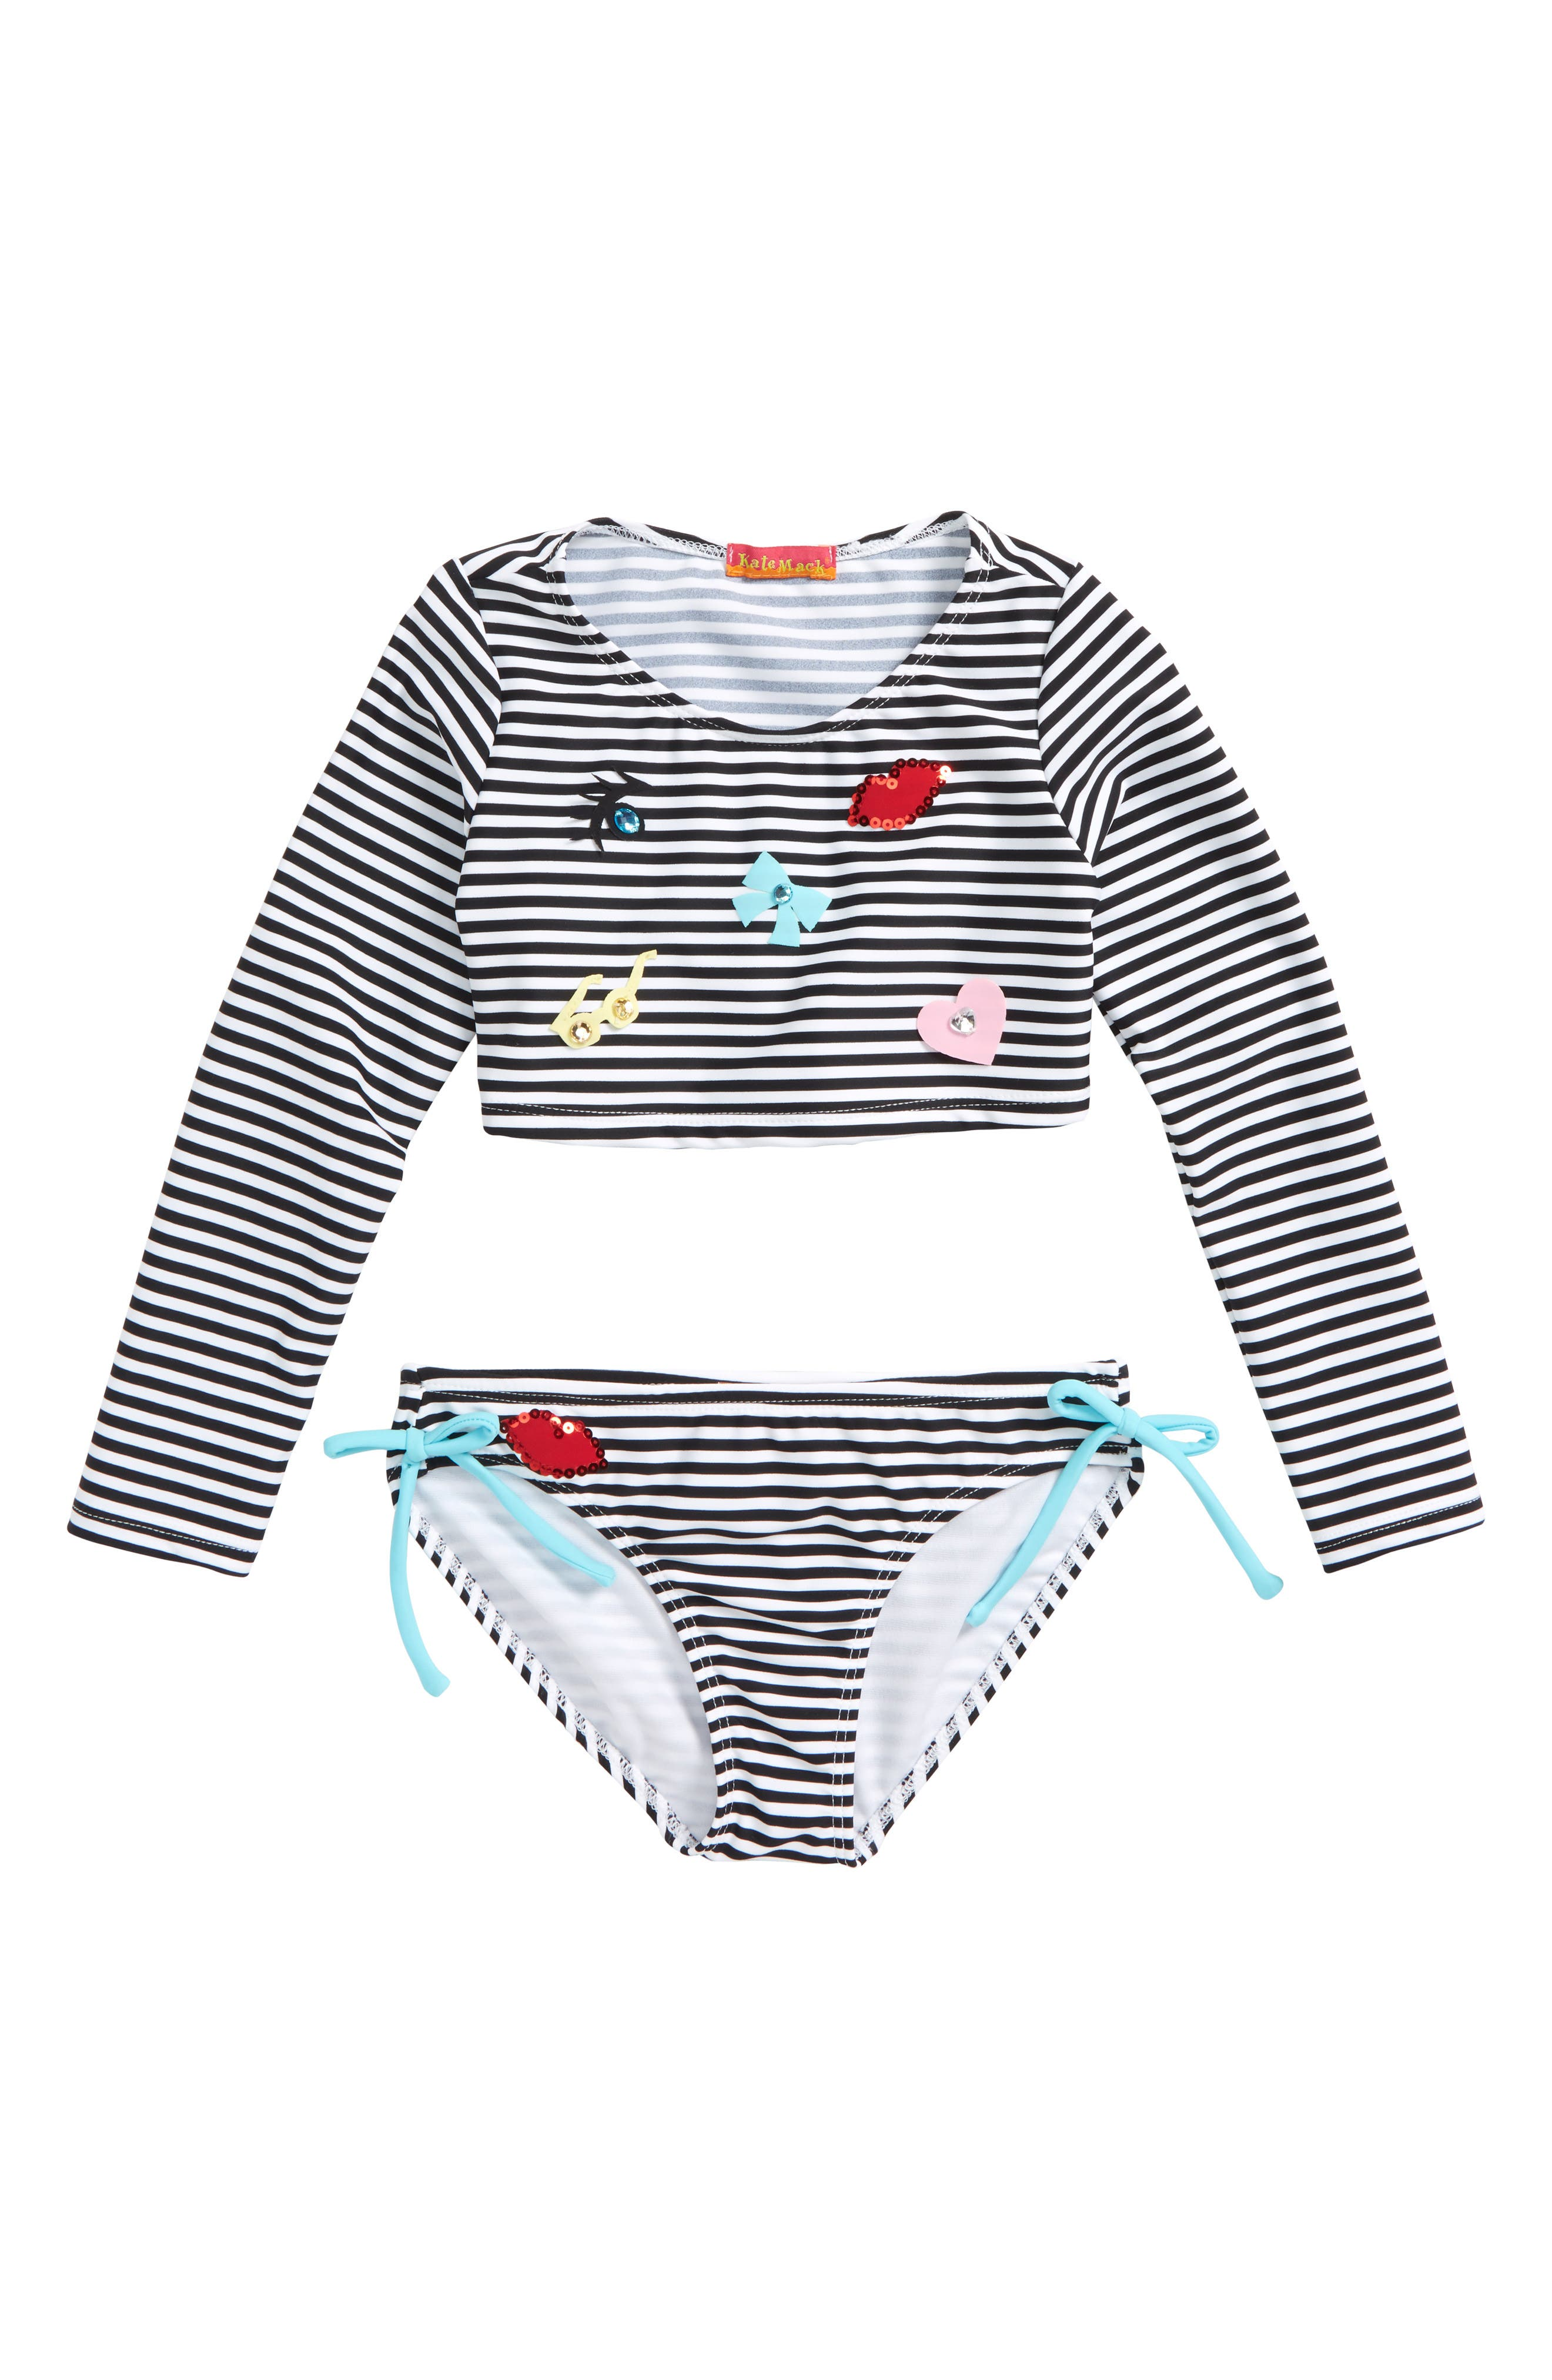 Stripe Two-Piece Rashguard Swimsuit,                         Main,                         color, Black/ White